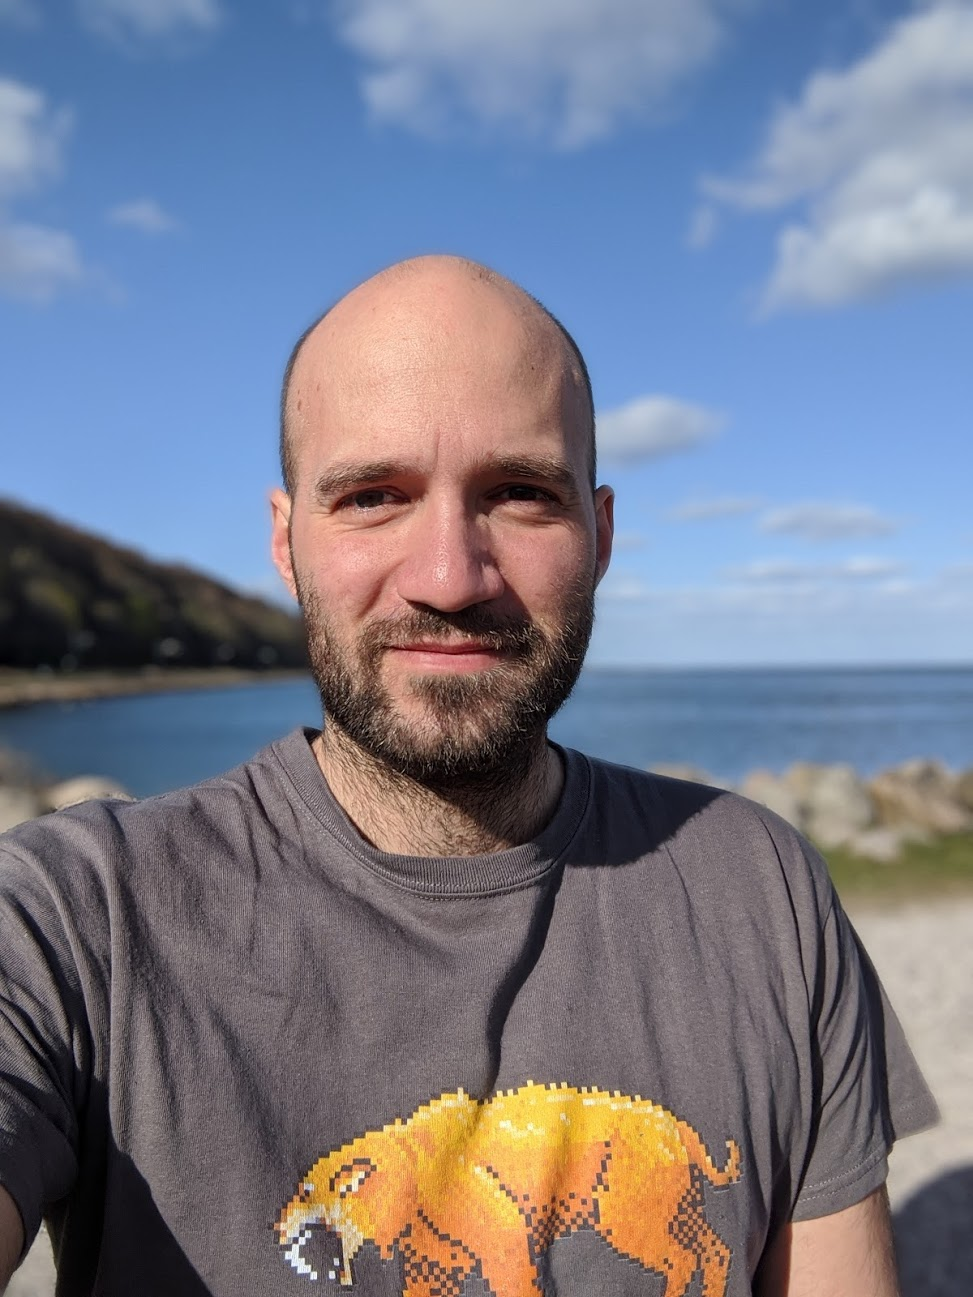 Rasmus Østergaard Pedersen